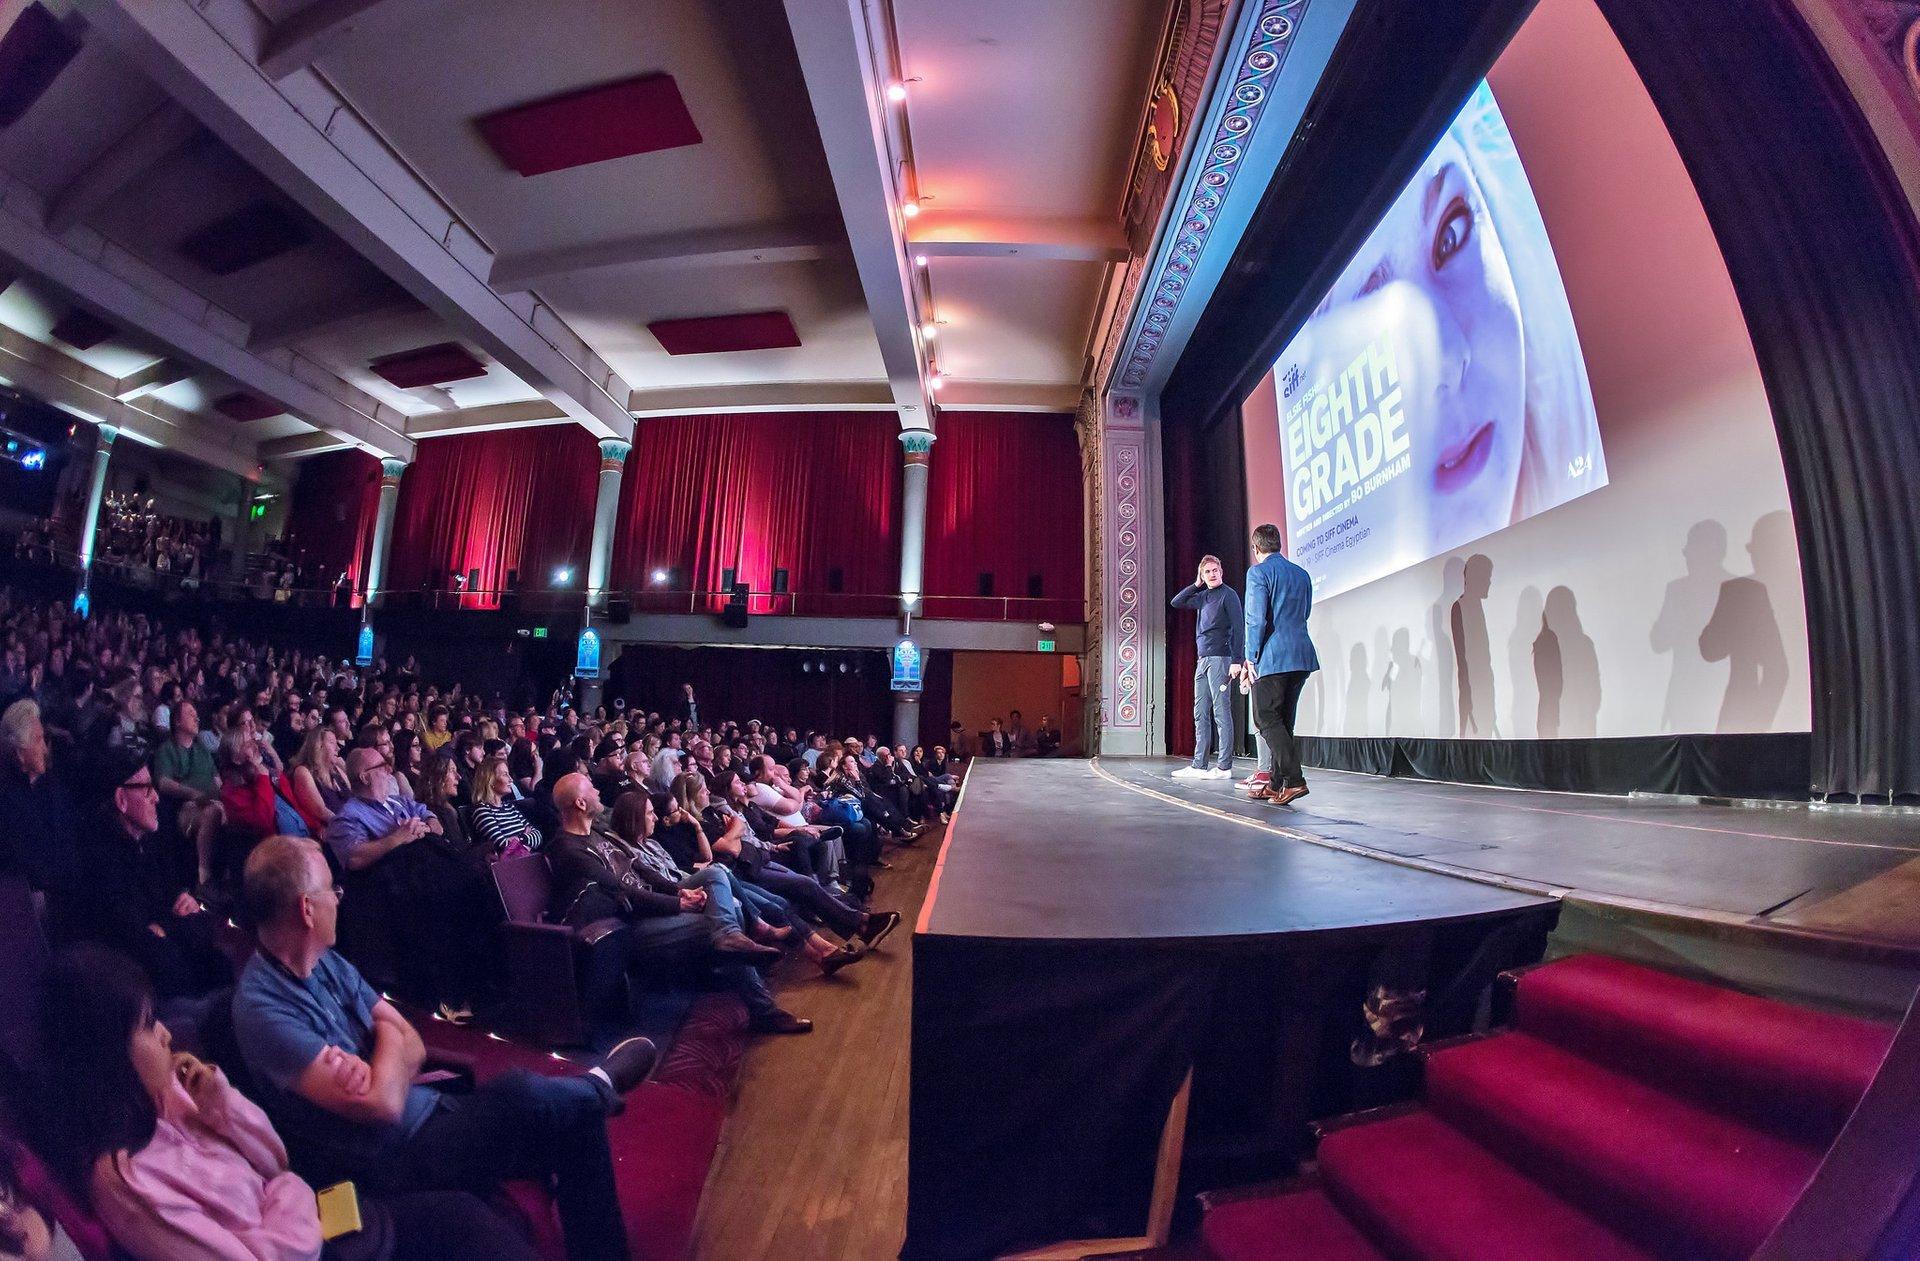 Seattle International Film Festival (SIFF) 2021 - Dates